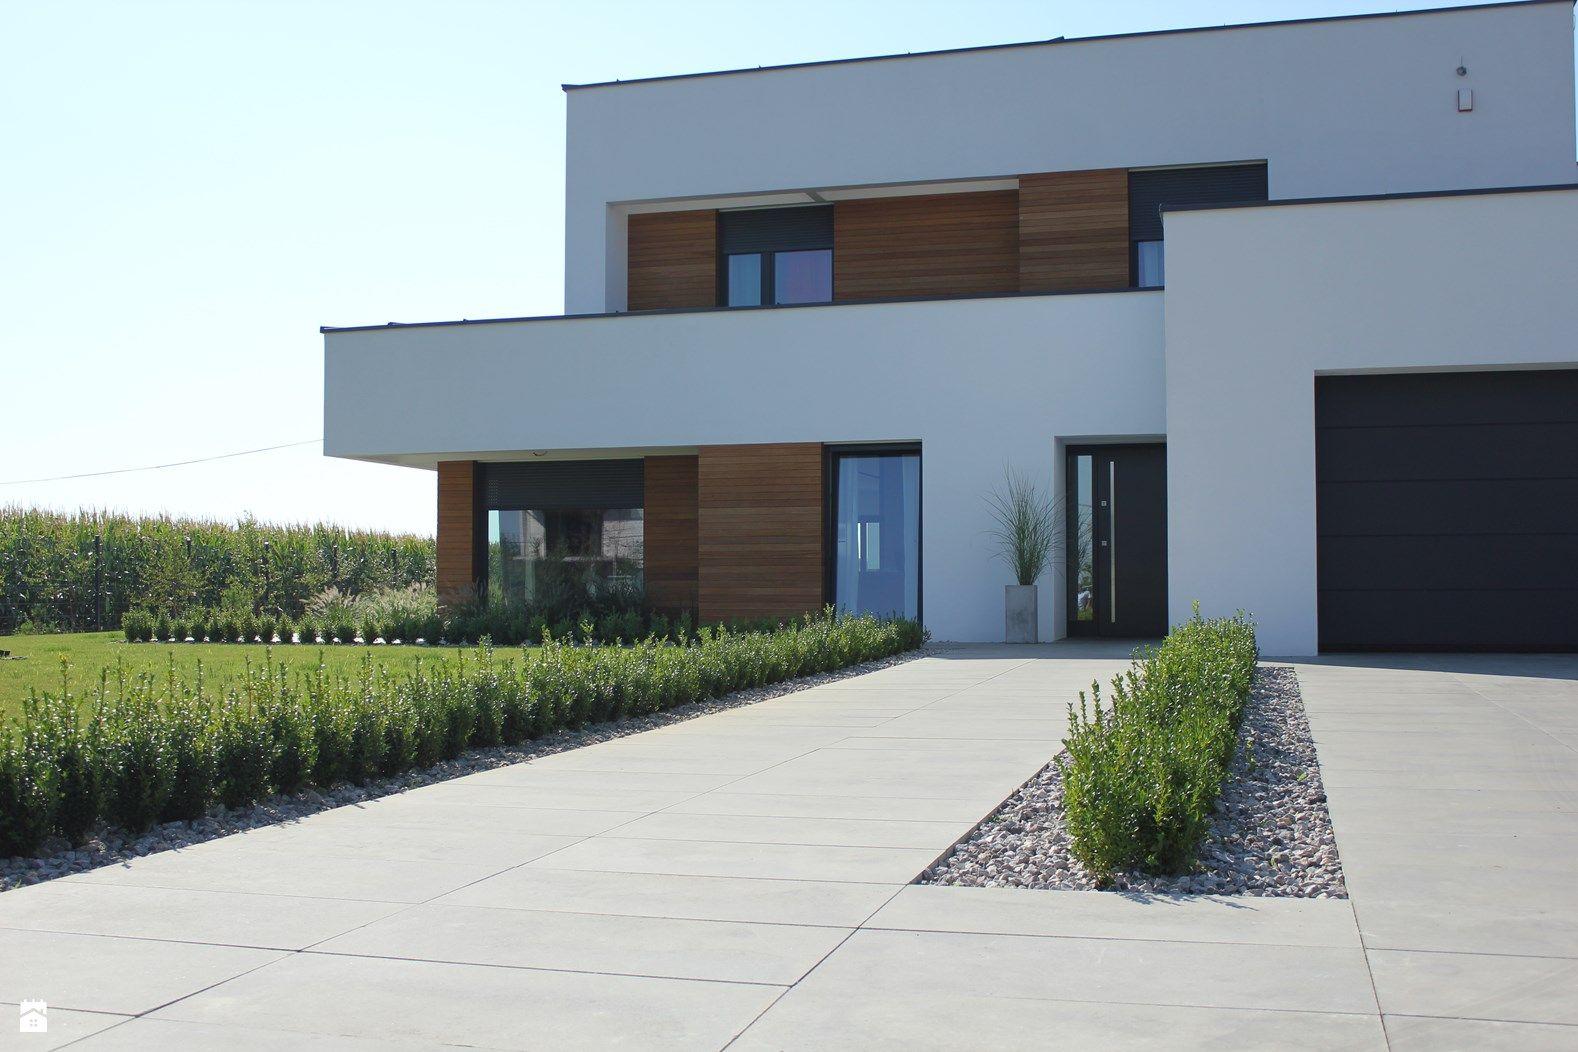 domy zdj cie od jadar domy jadar maison moderne pinterest maison amenagement maison. Black Bedroom Furniture Sets. Home Design Ideas